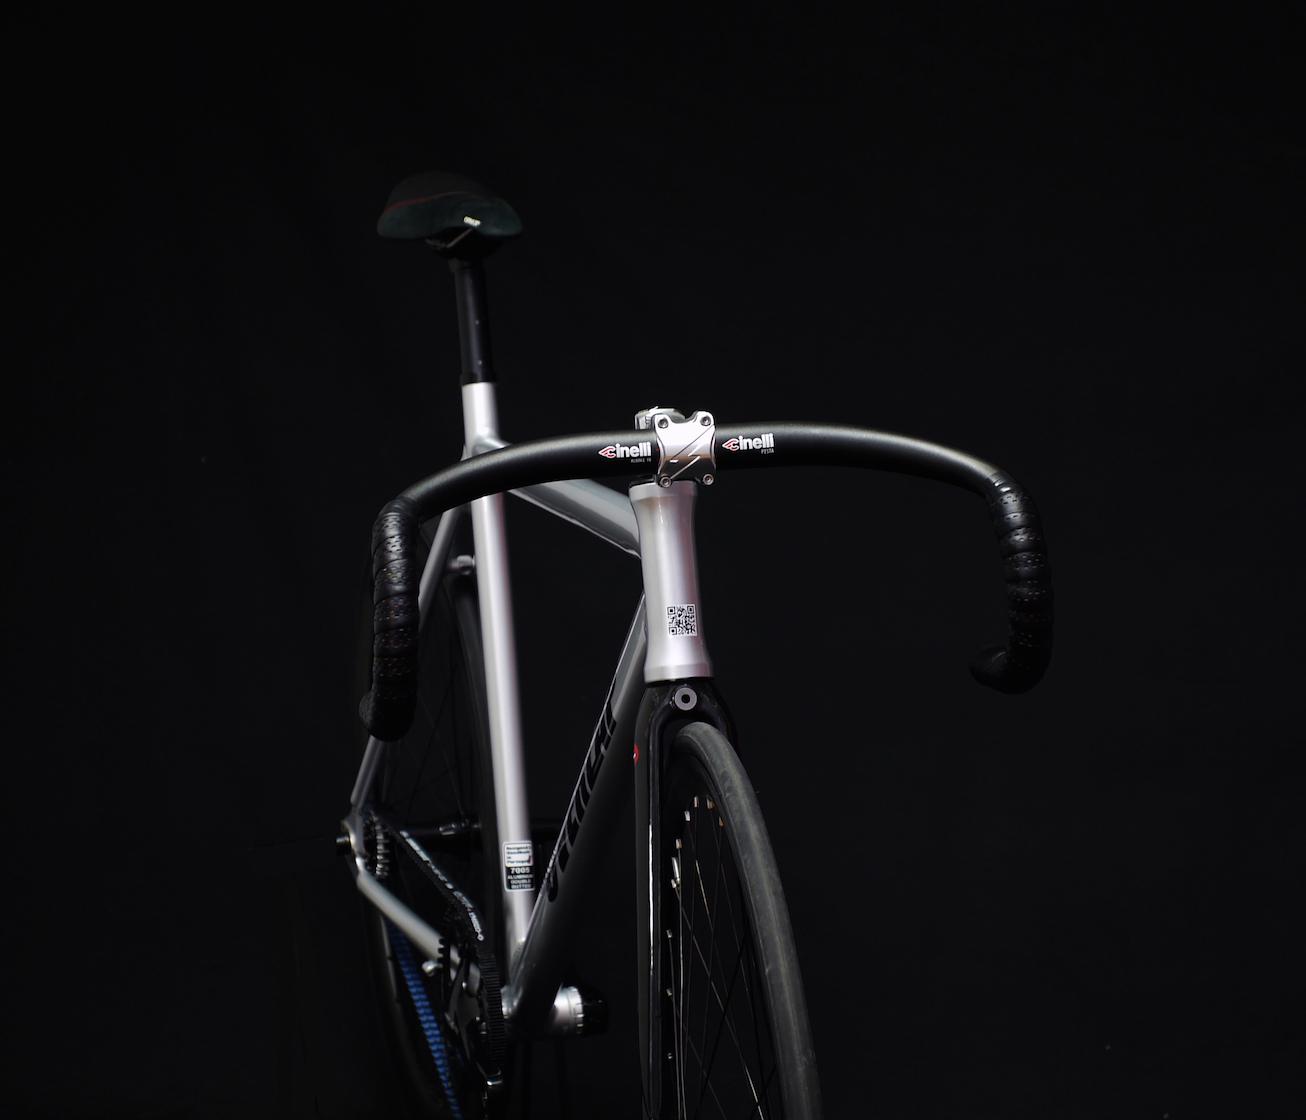 Tags Belt Drive Bicicleta Bikes Carbon Cinelli Columbus Fixedgear Fixie Gates Lightskin Overlap Pura